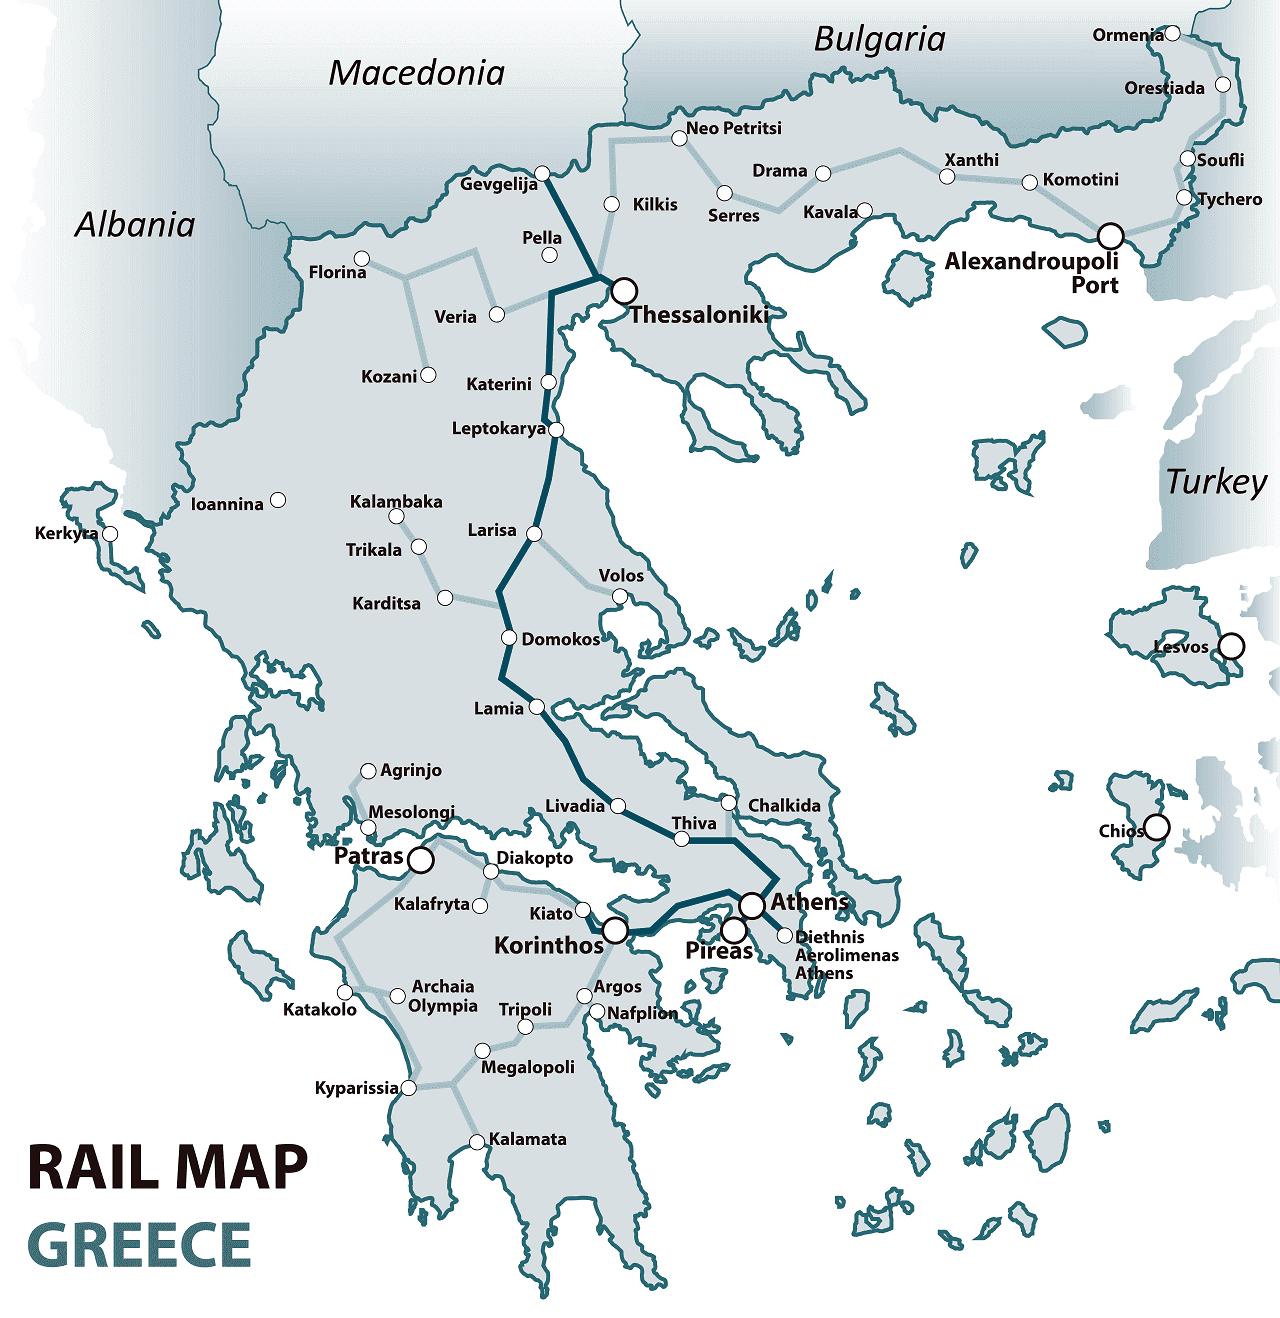 Greece rail map